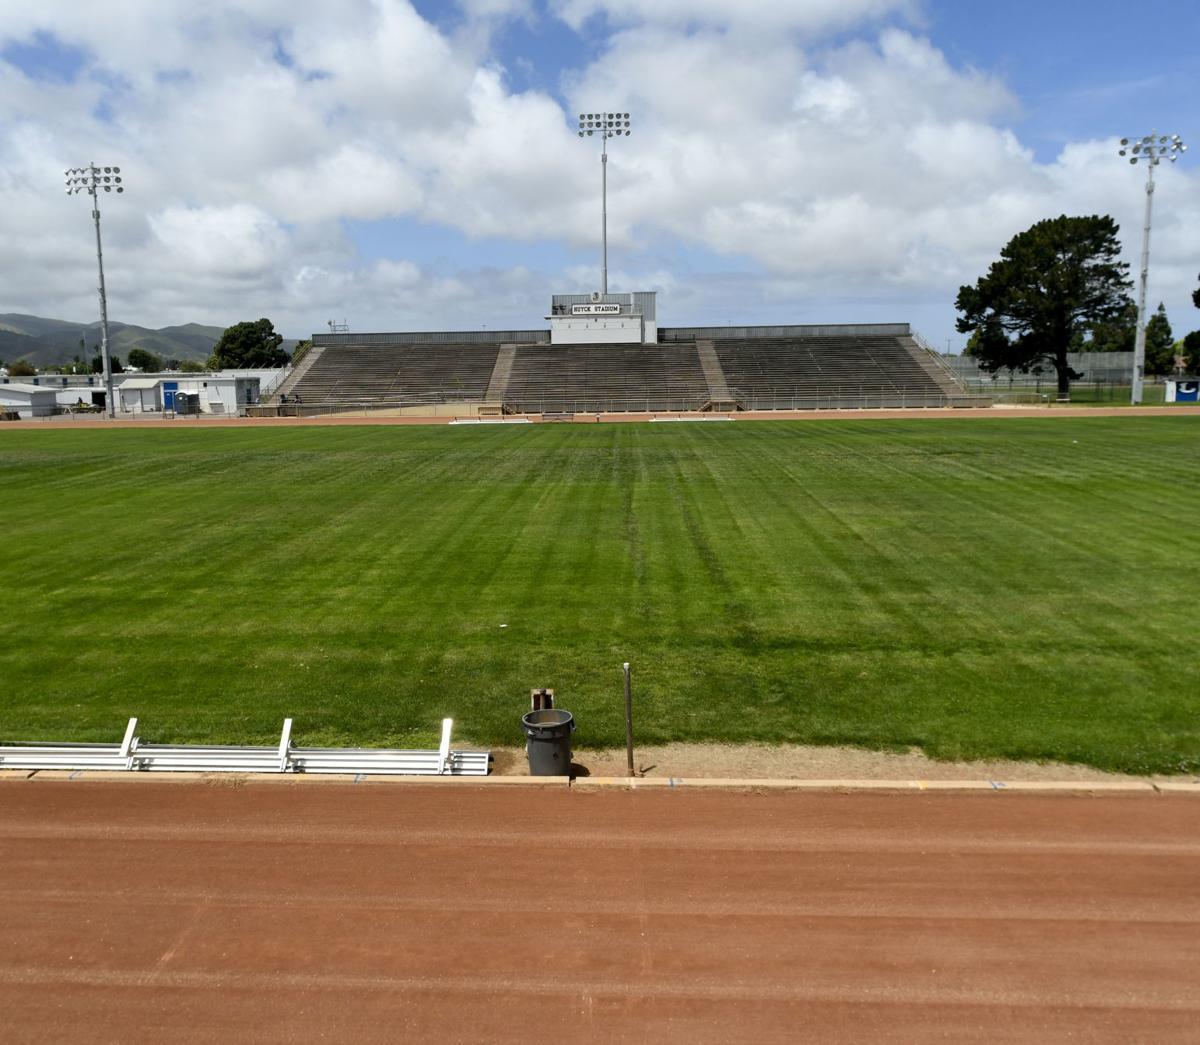 052119 Huyck Stadium 02.jpg